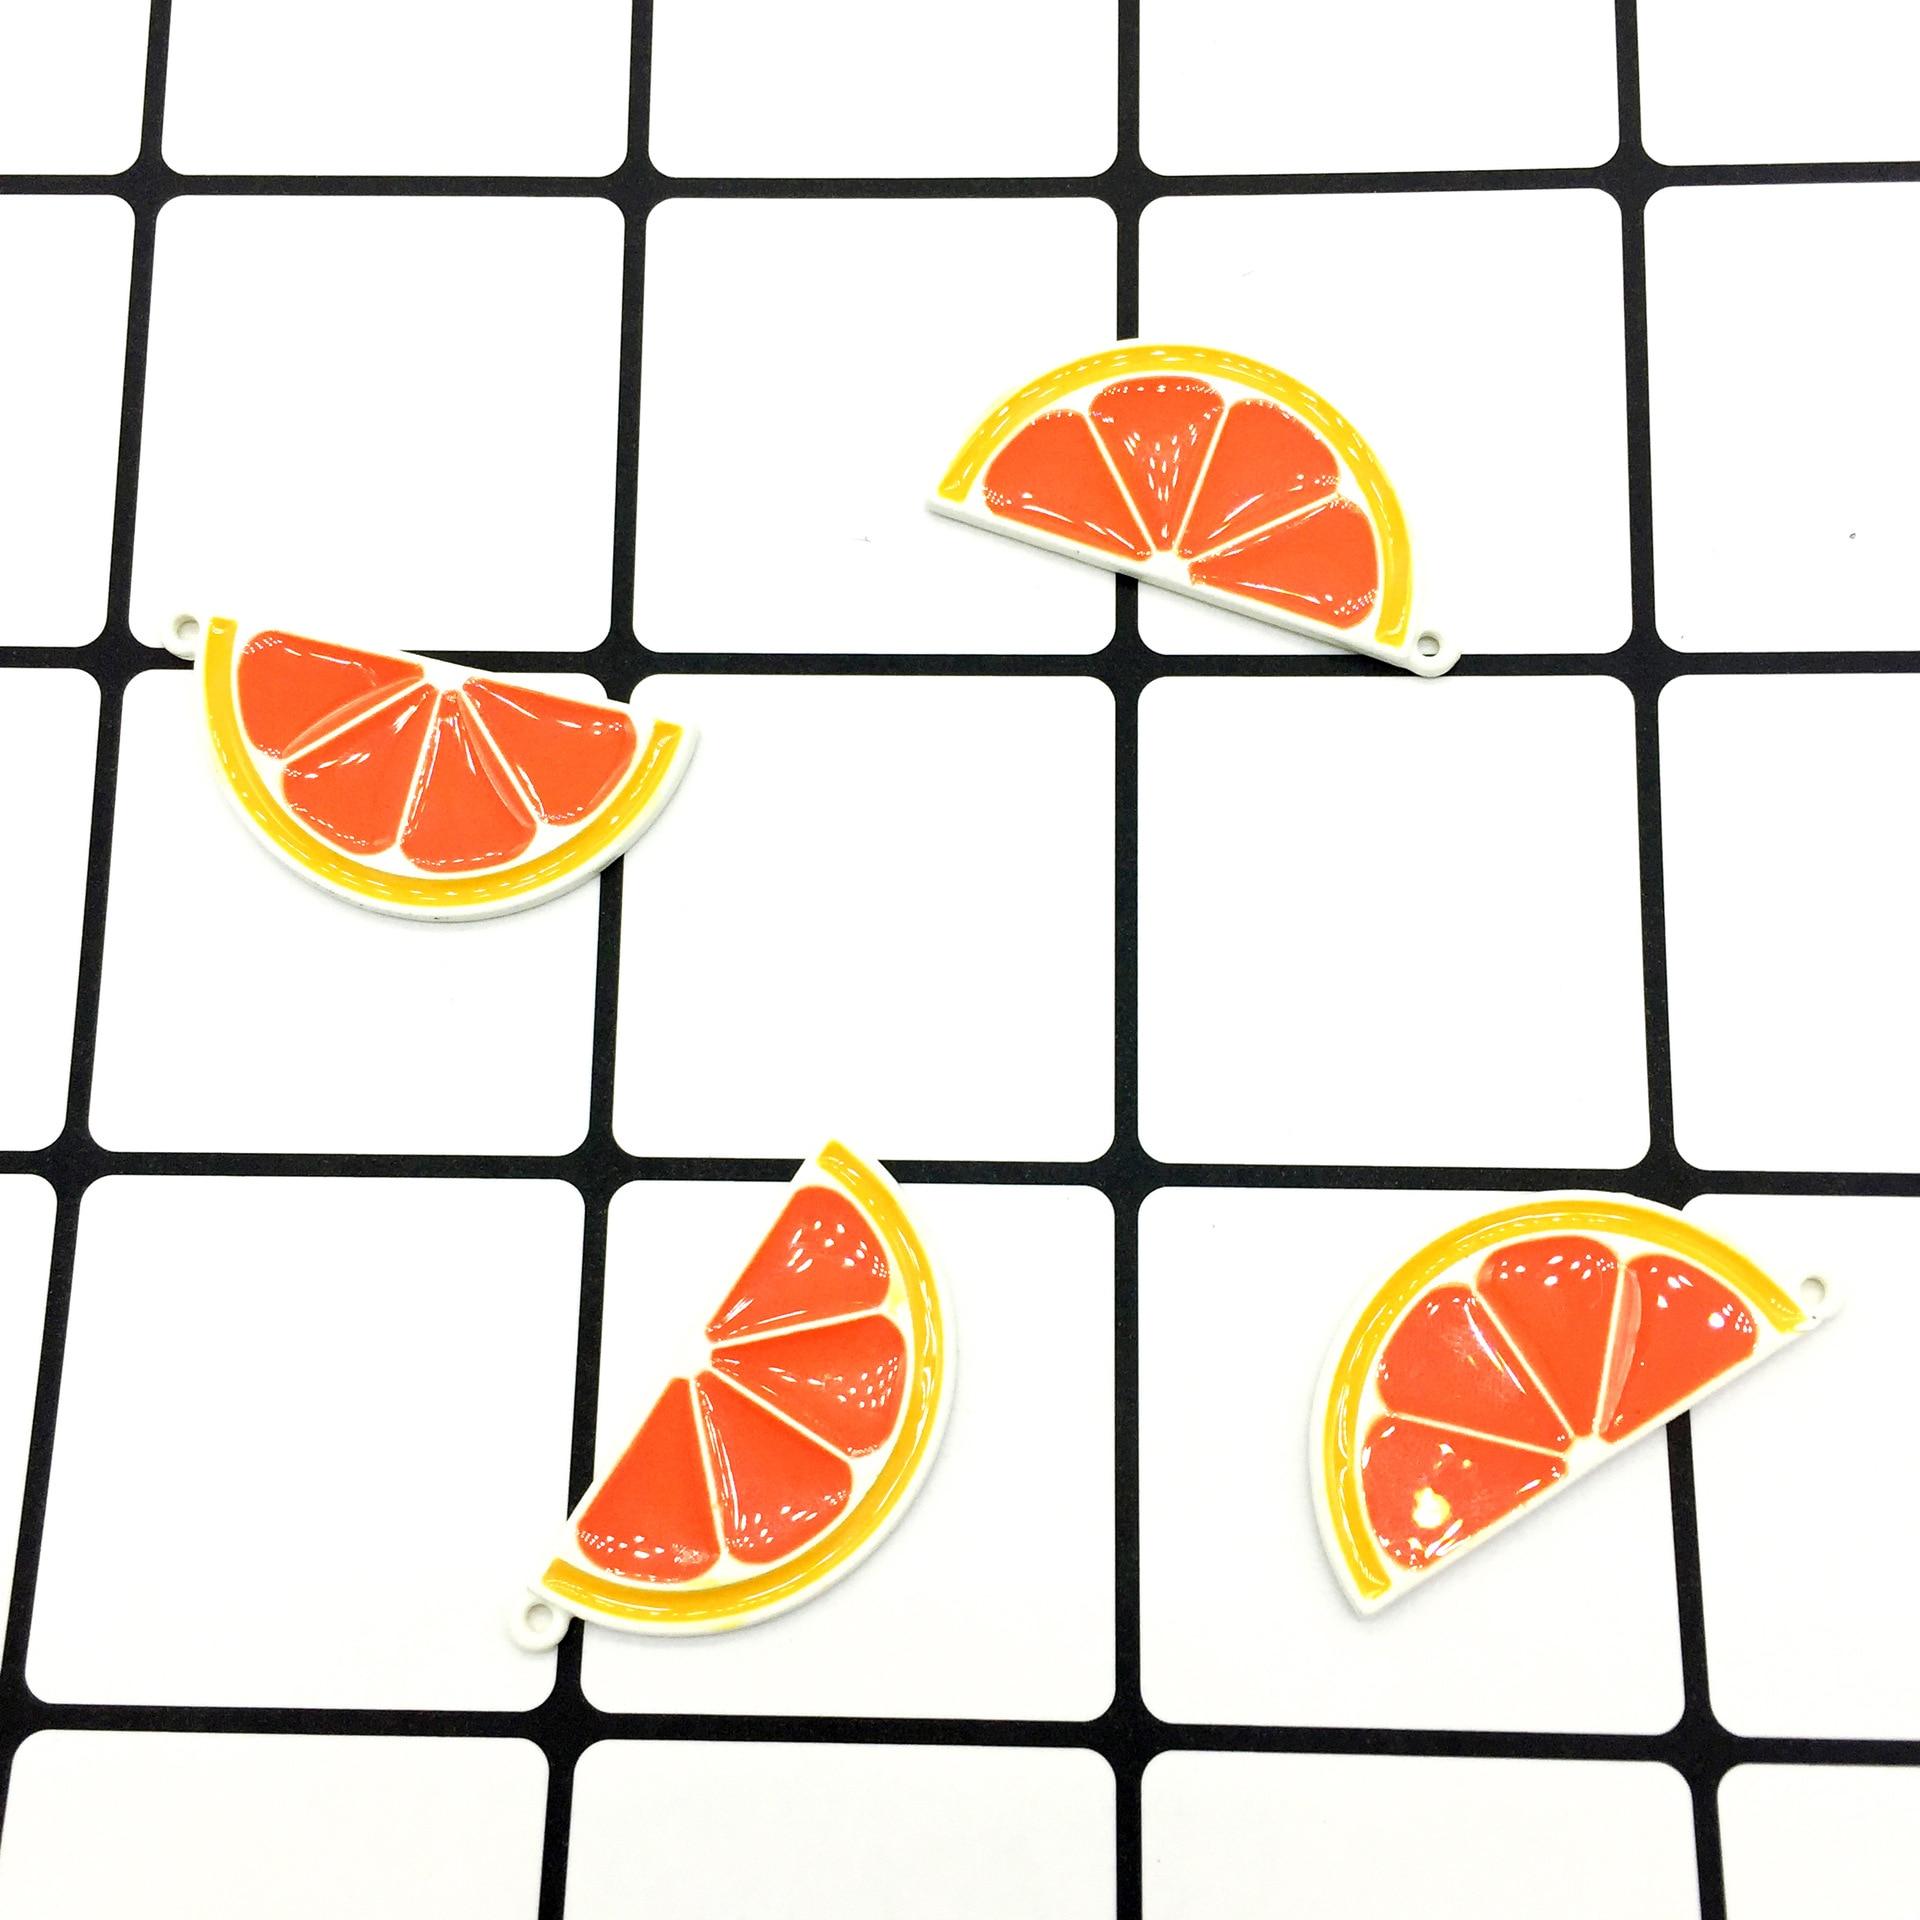 10 PC New Fashion Fruit Orange Metal Enamel Charms Fit DIY Bracelet Earring Necklace Jewelry Accessory DIY Craft